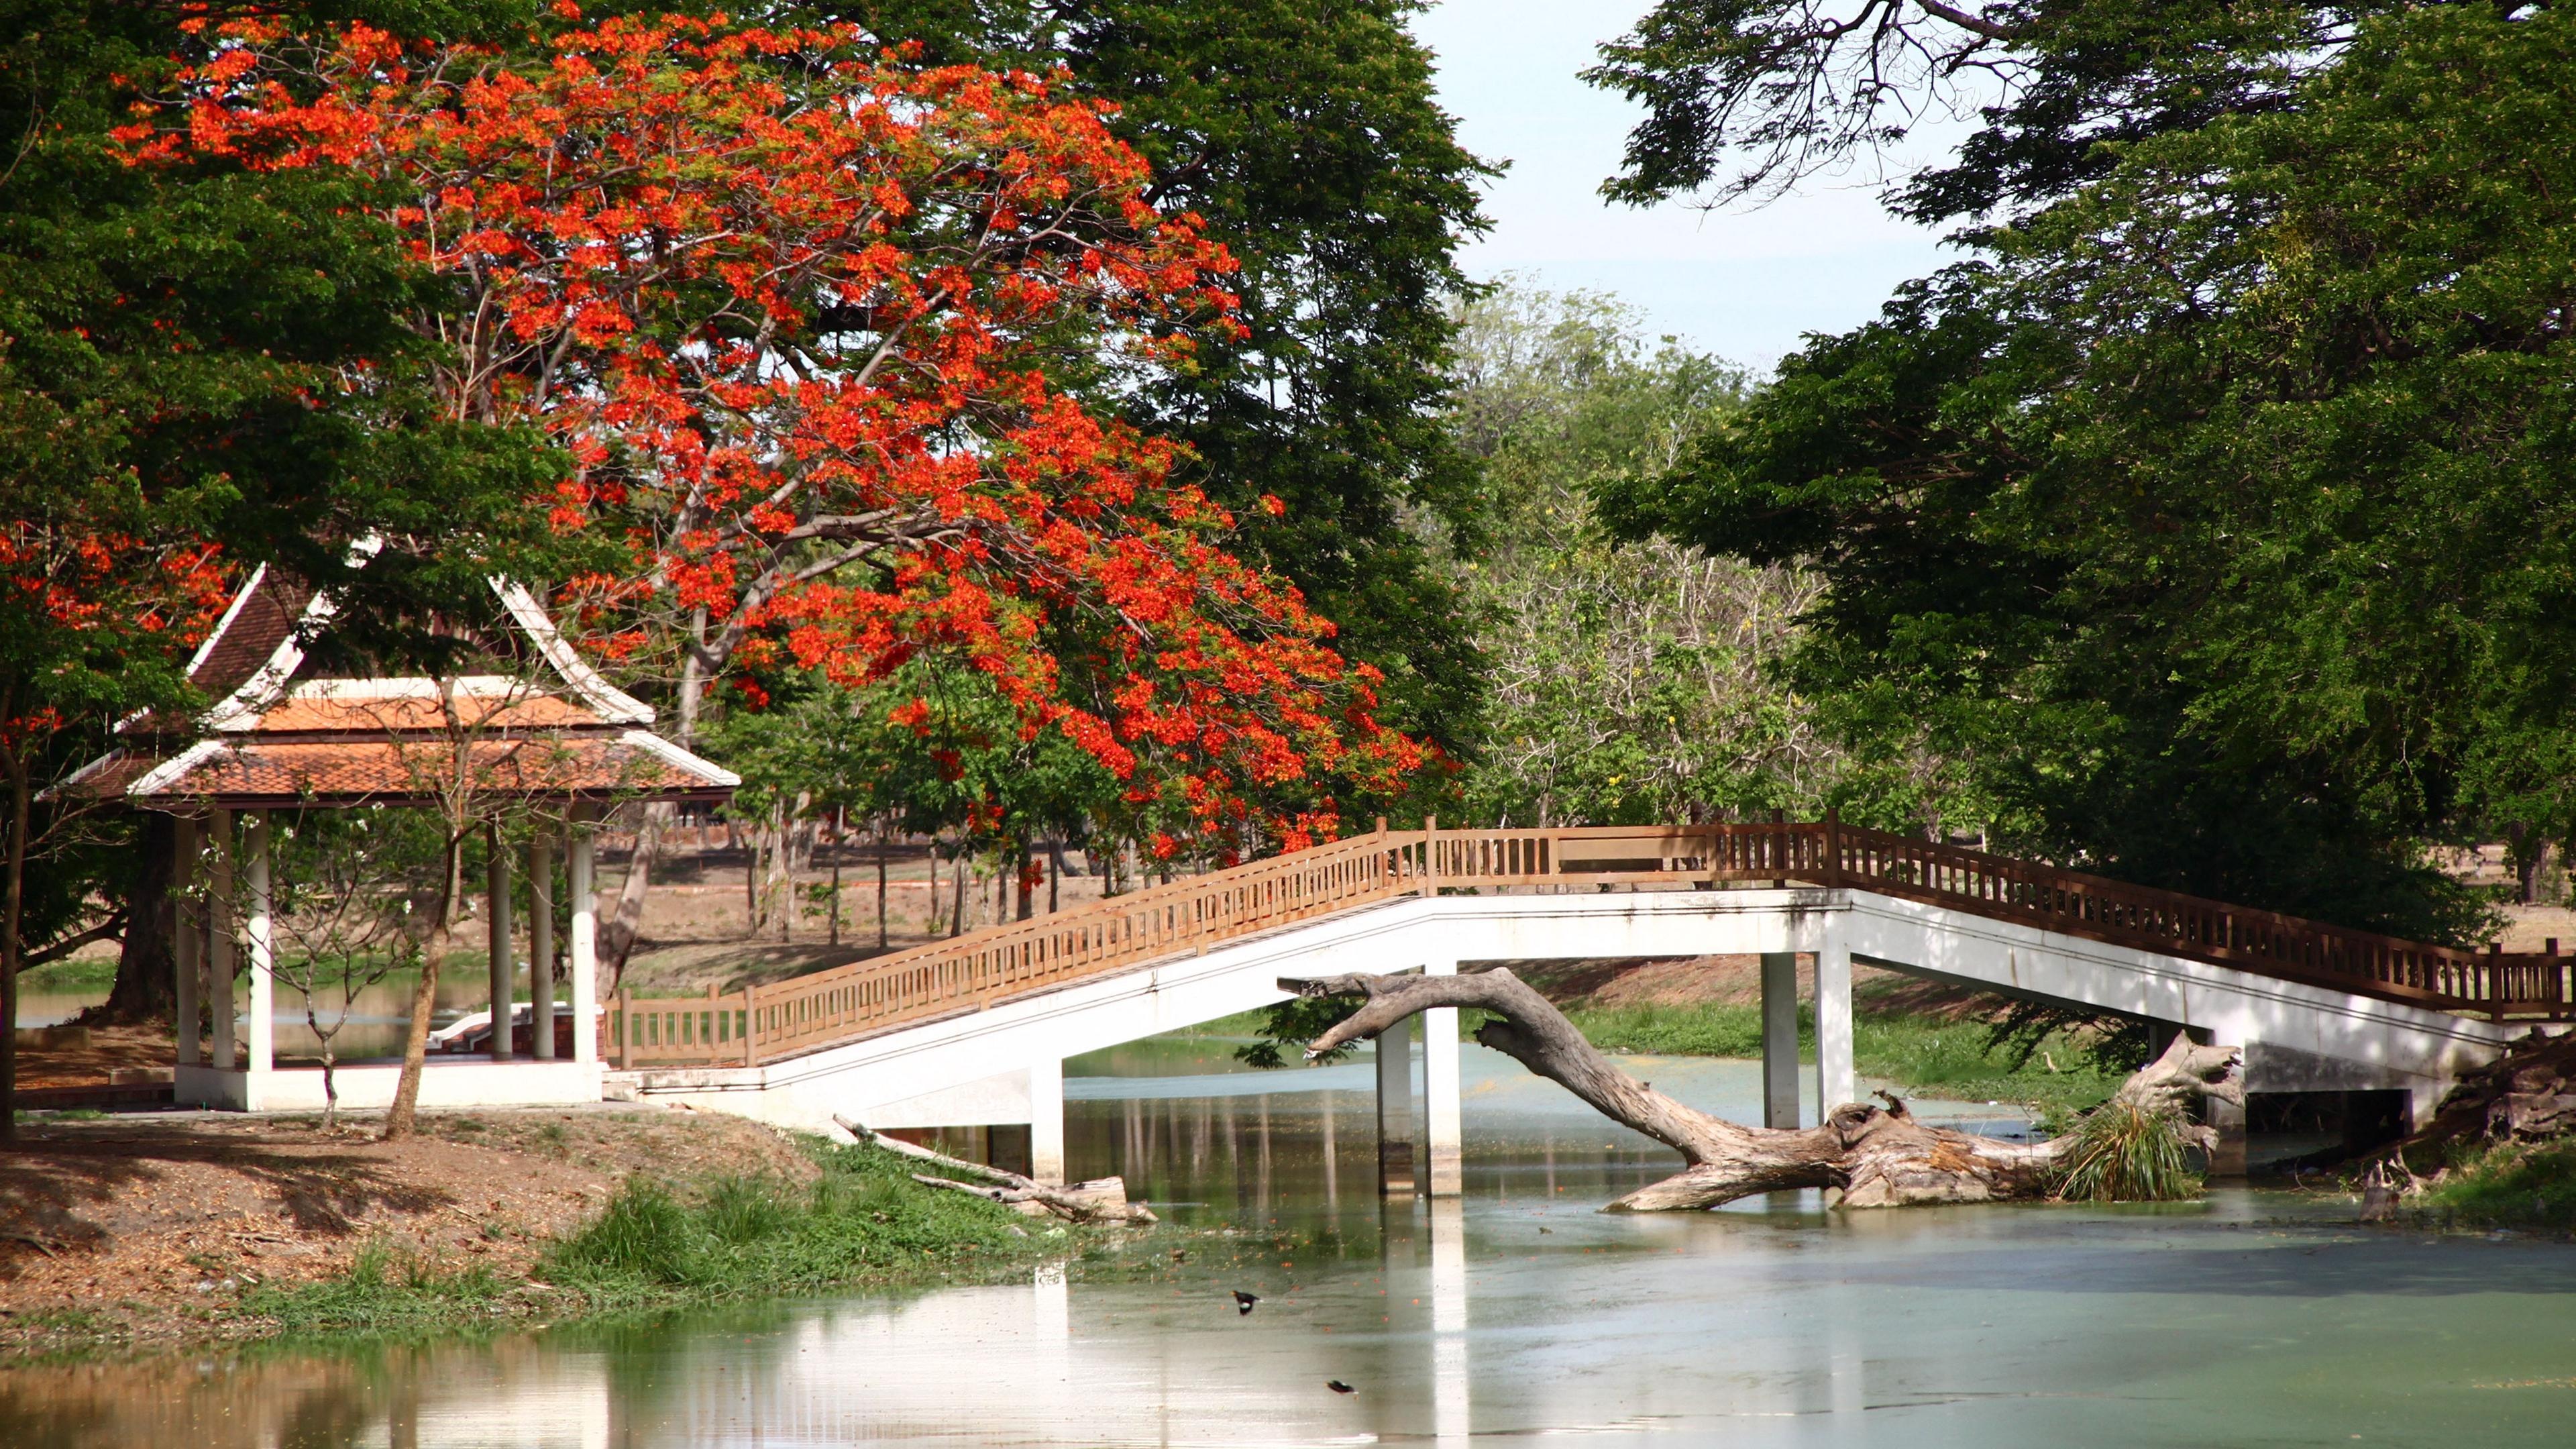 bridge arbor japan snag 4k 1541117609 - bridge, arbor, japan, snag 4k - Japan, bridge, arbor